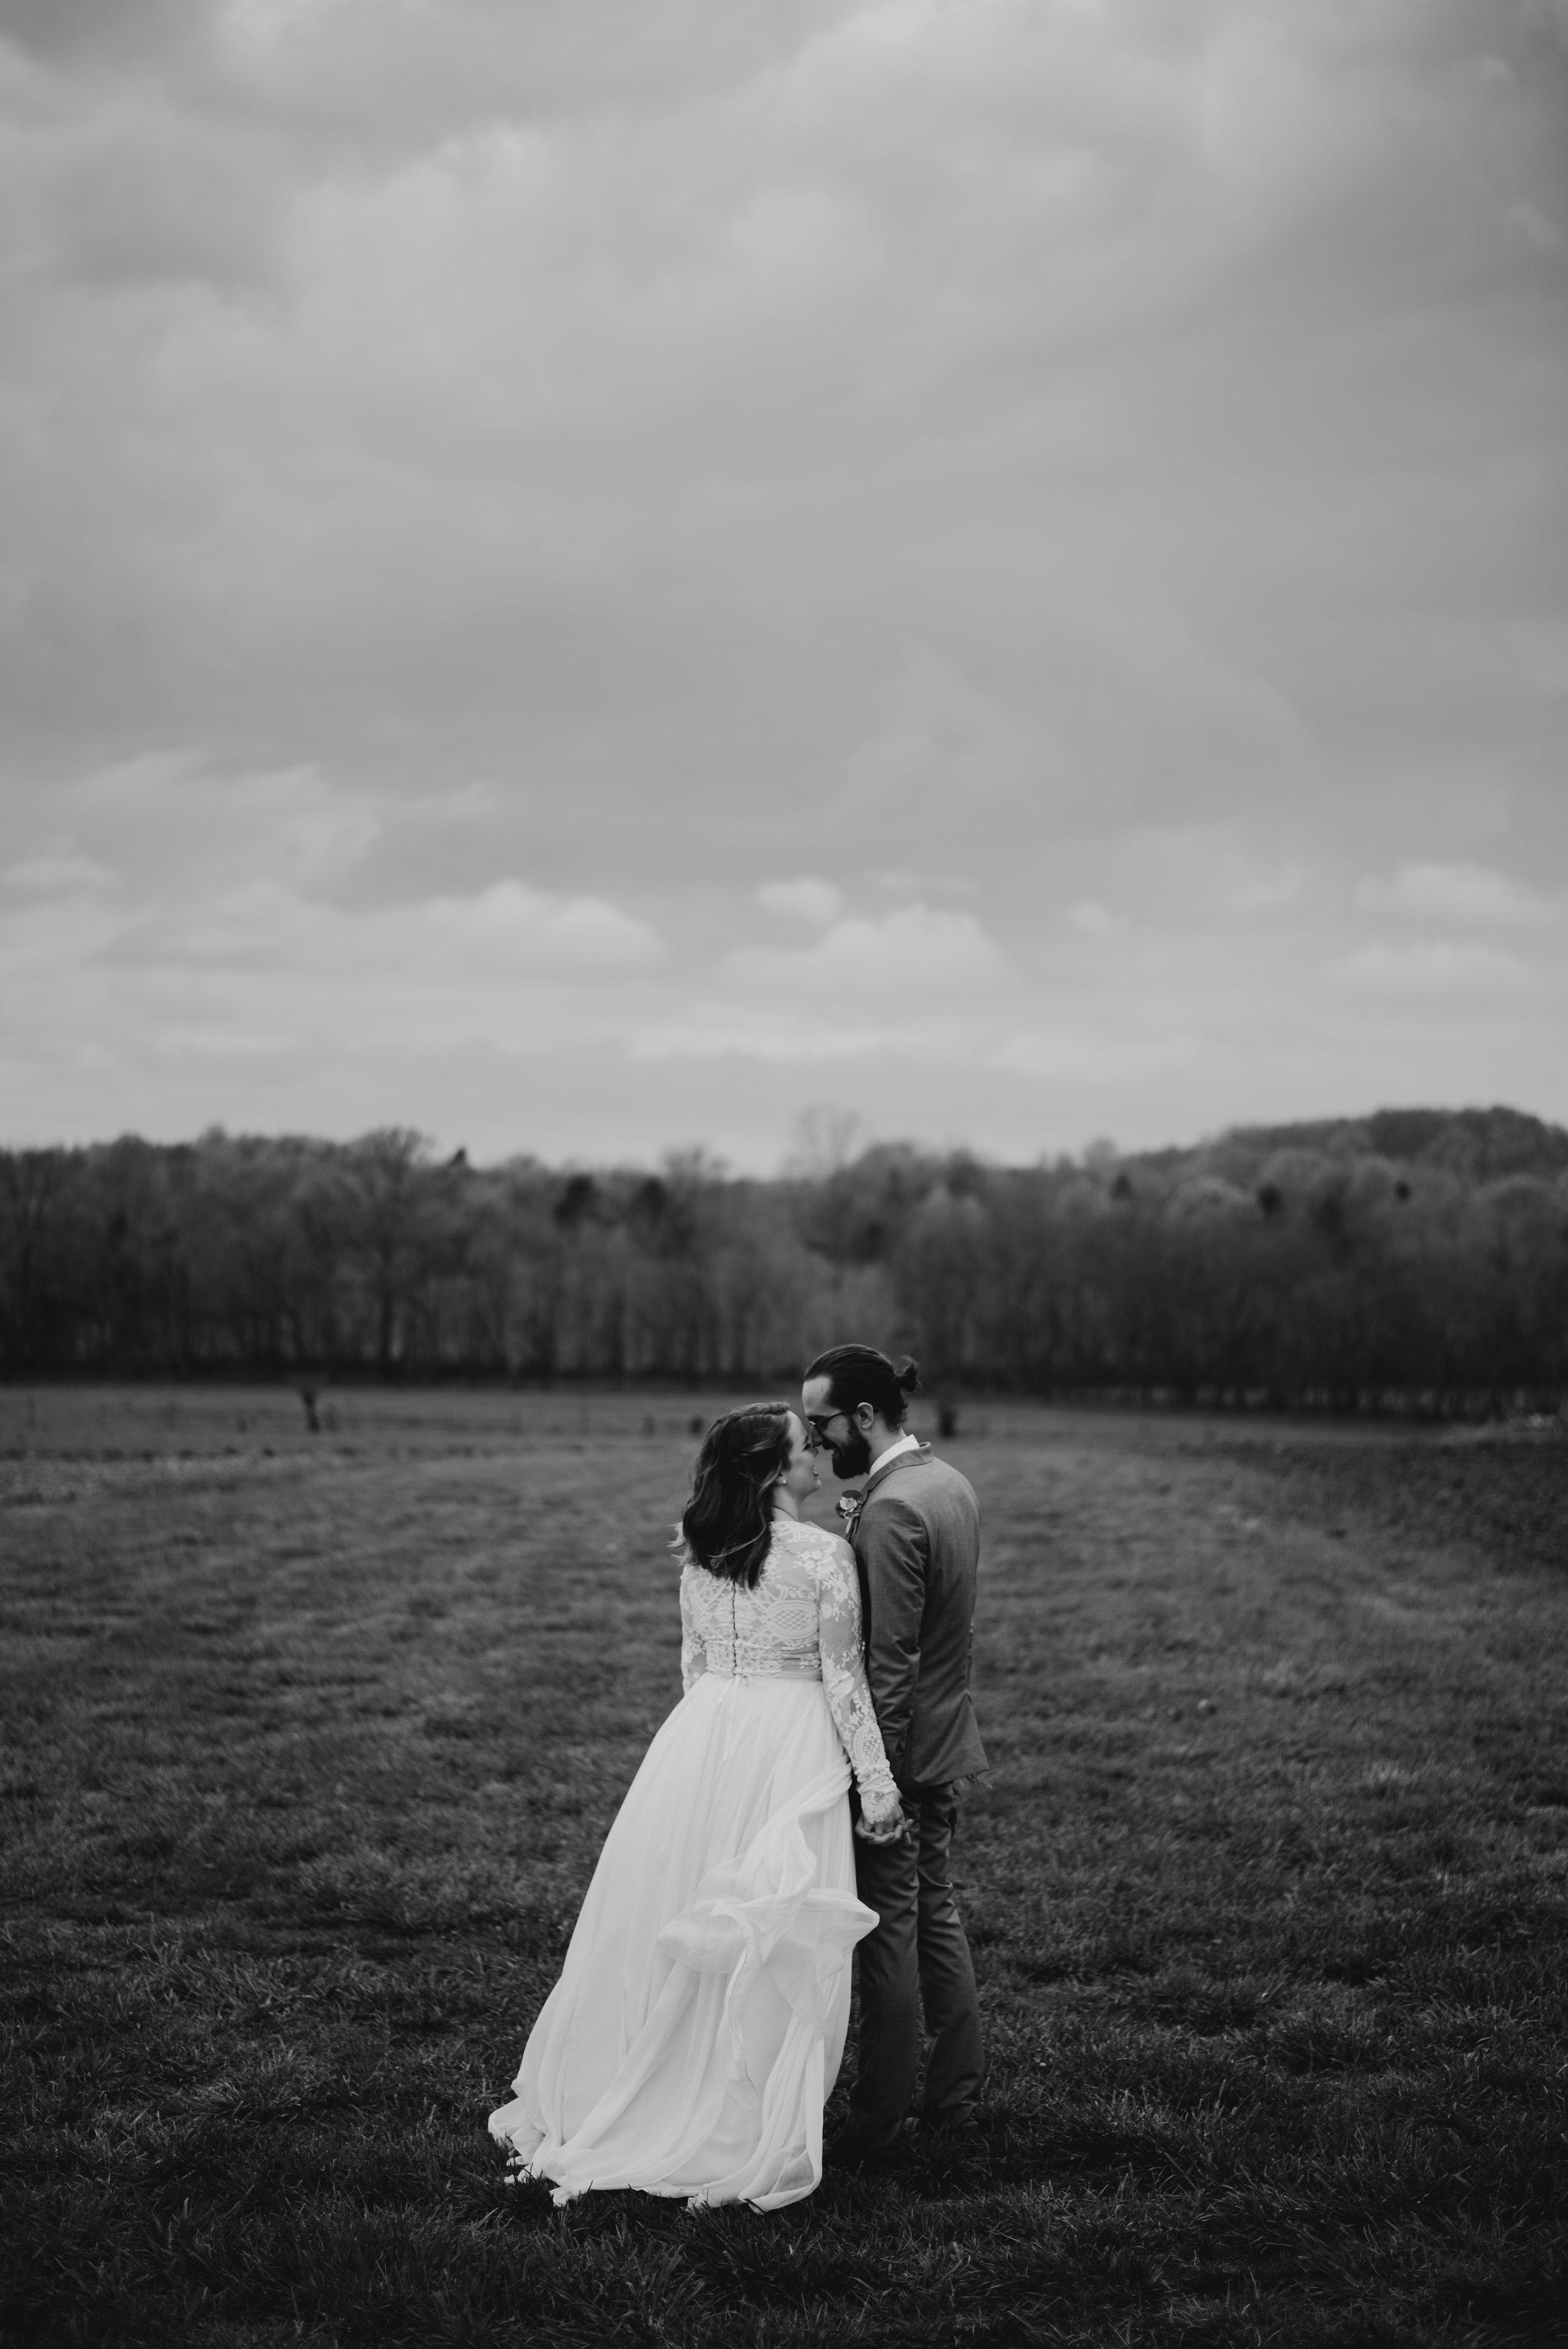 Allenbrooke-Farms-Nashville-Wedding-Photographers 23.jpg